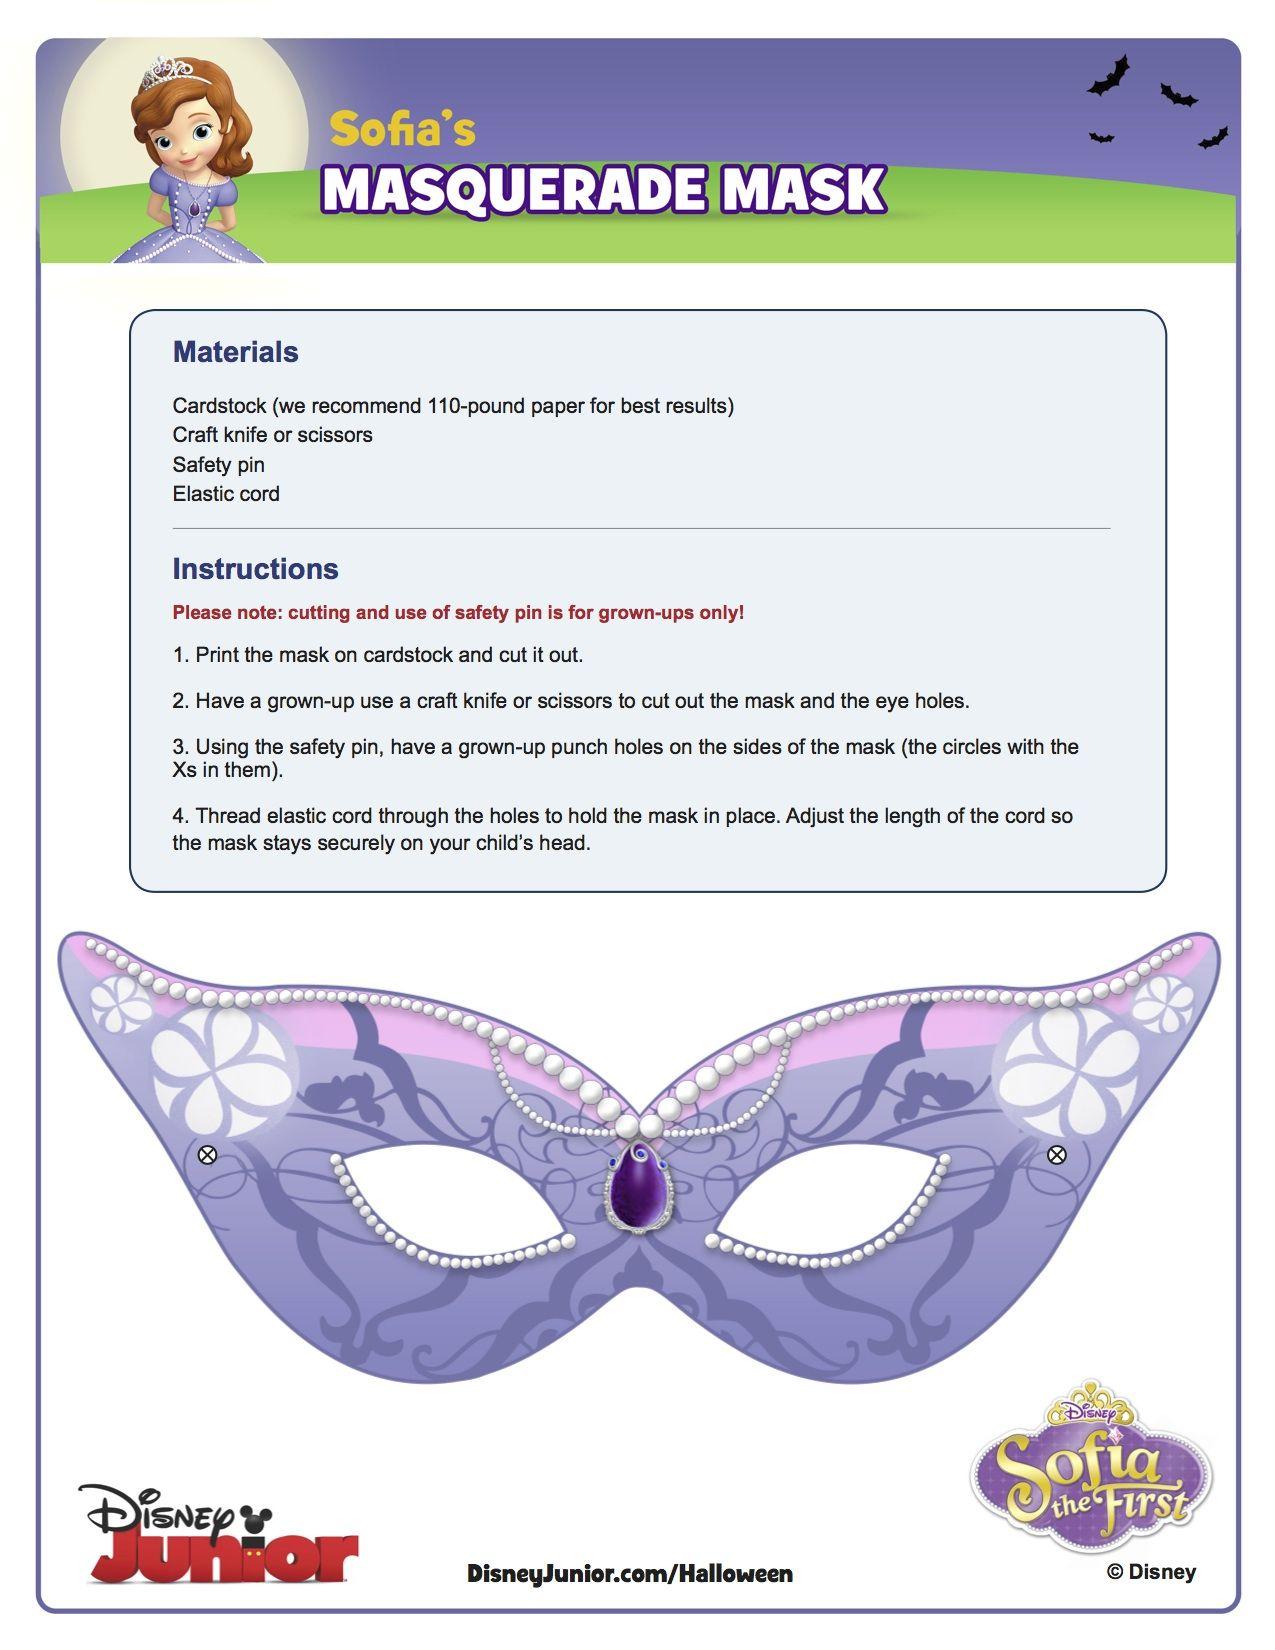 sofia's masquerade mask! | sofia the first party ideas | pinterest, Presentation templates